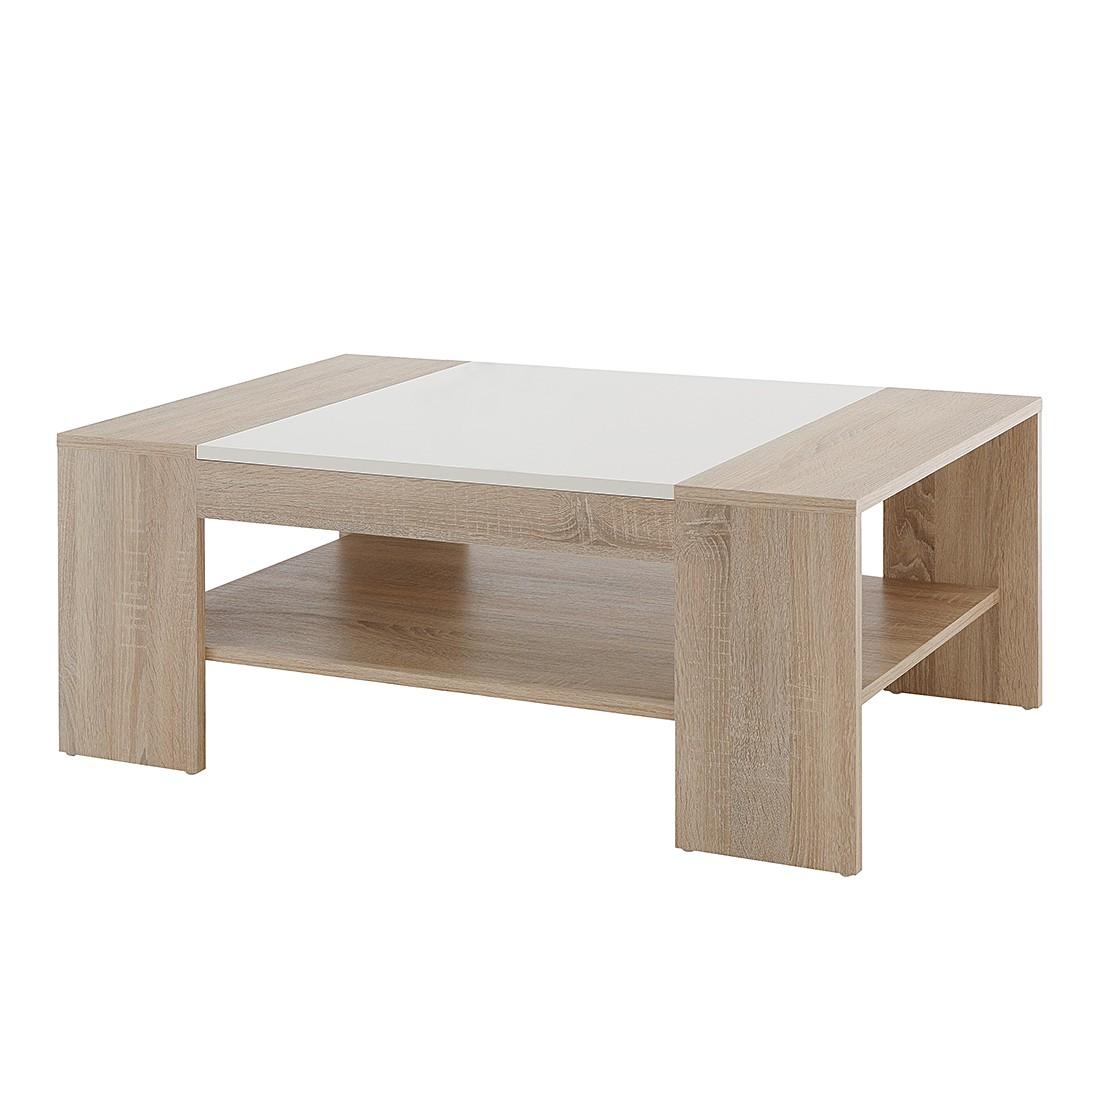 Table basse Liam - Imitation chêne de Sonoma / Blanc, Home Design